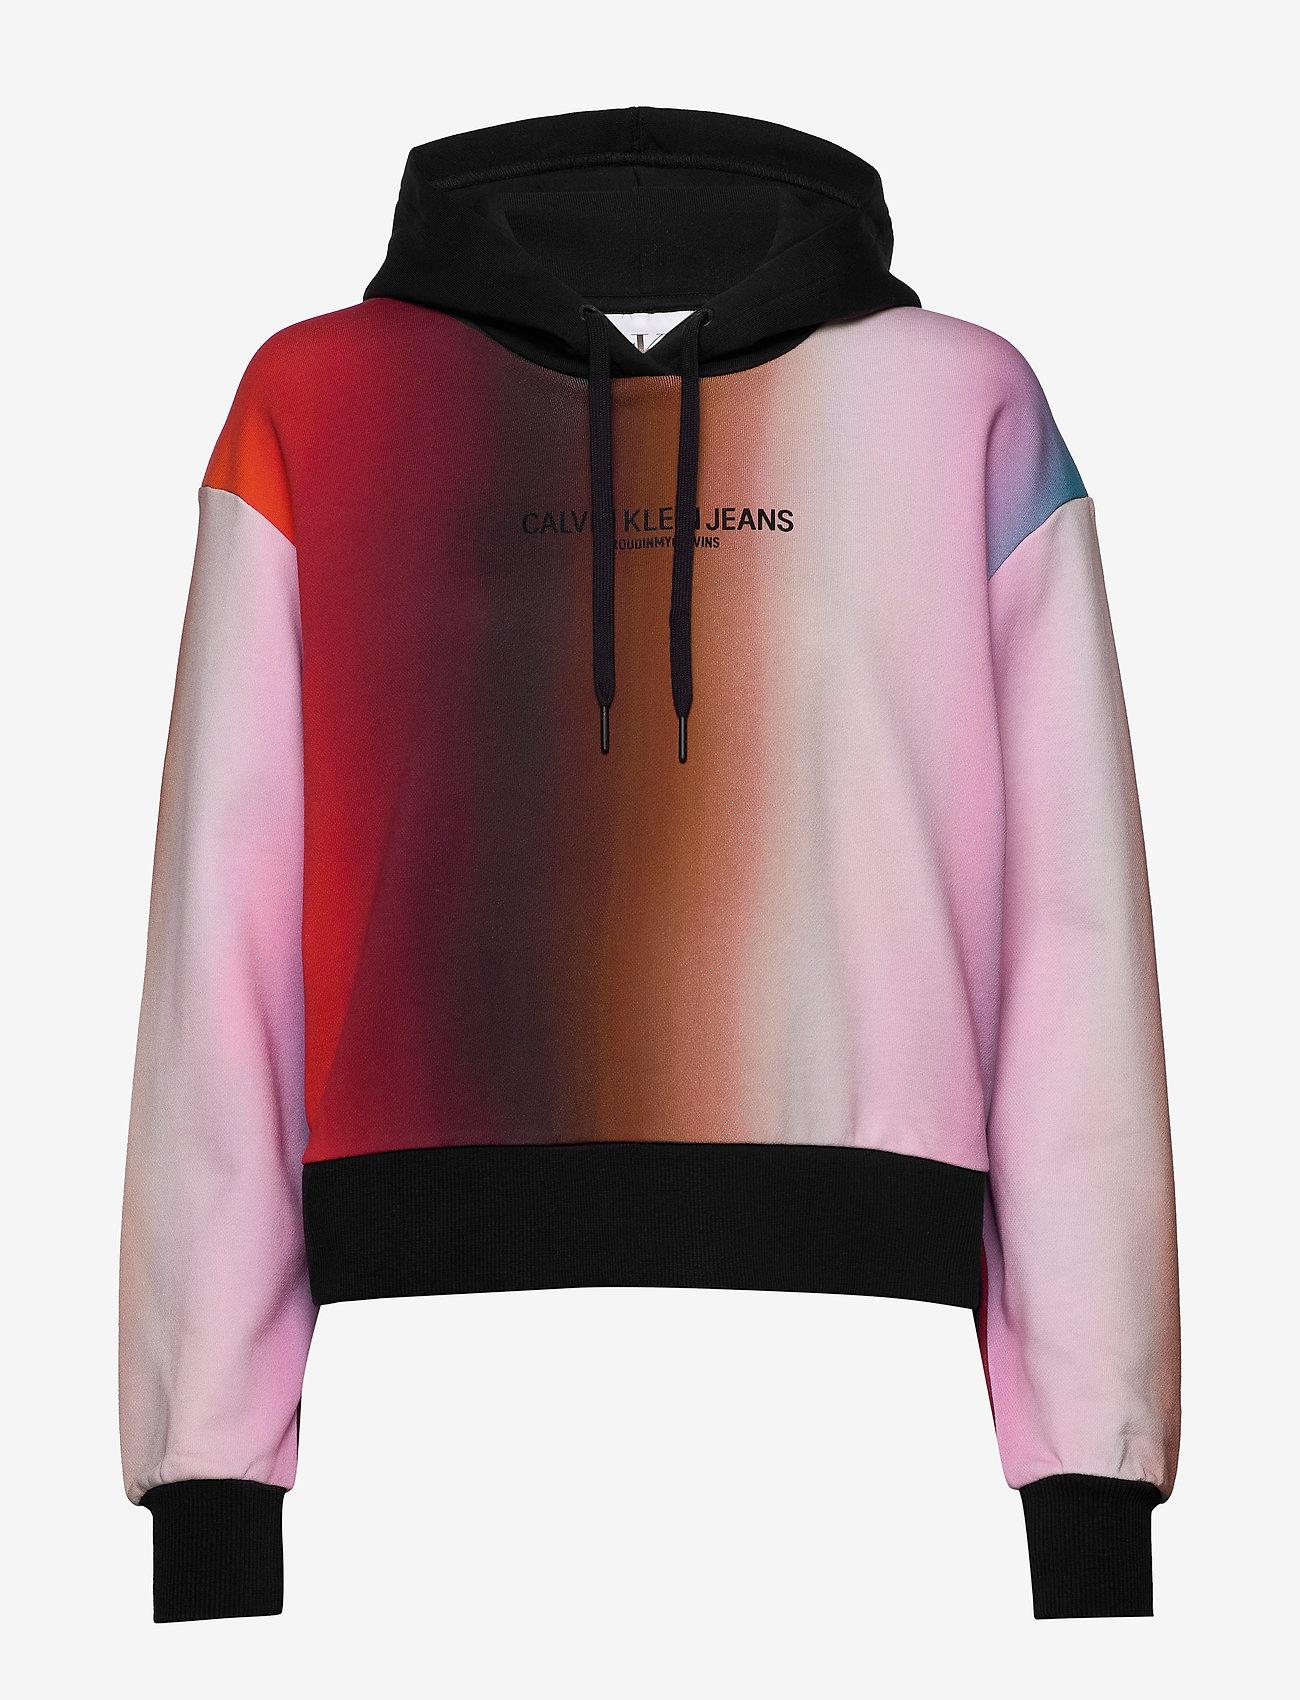 Calvin Klein Jeans - BLUR AOP OVERS - hettegensere - rainbow blur aop